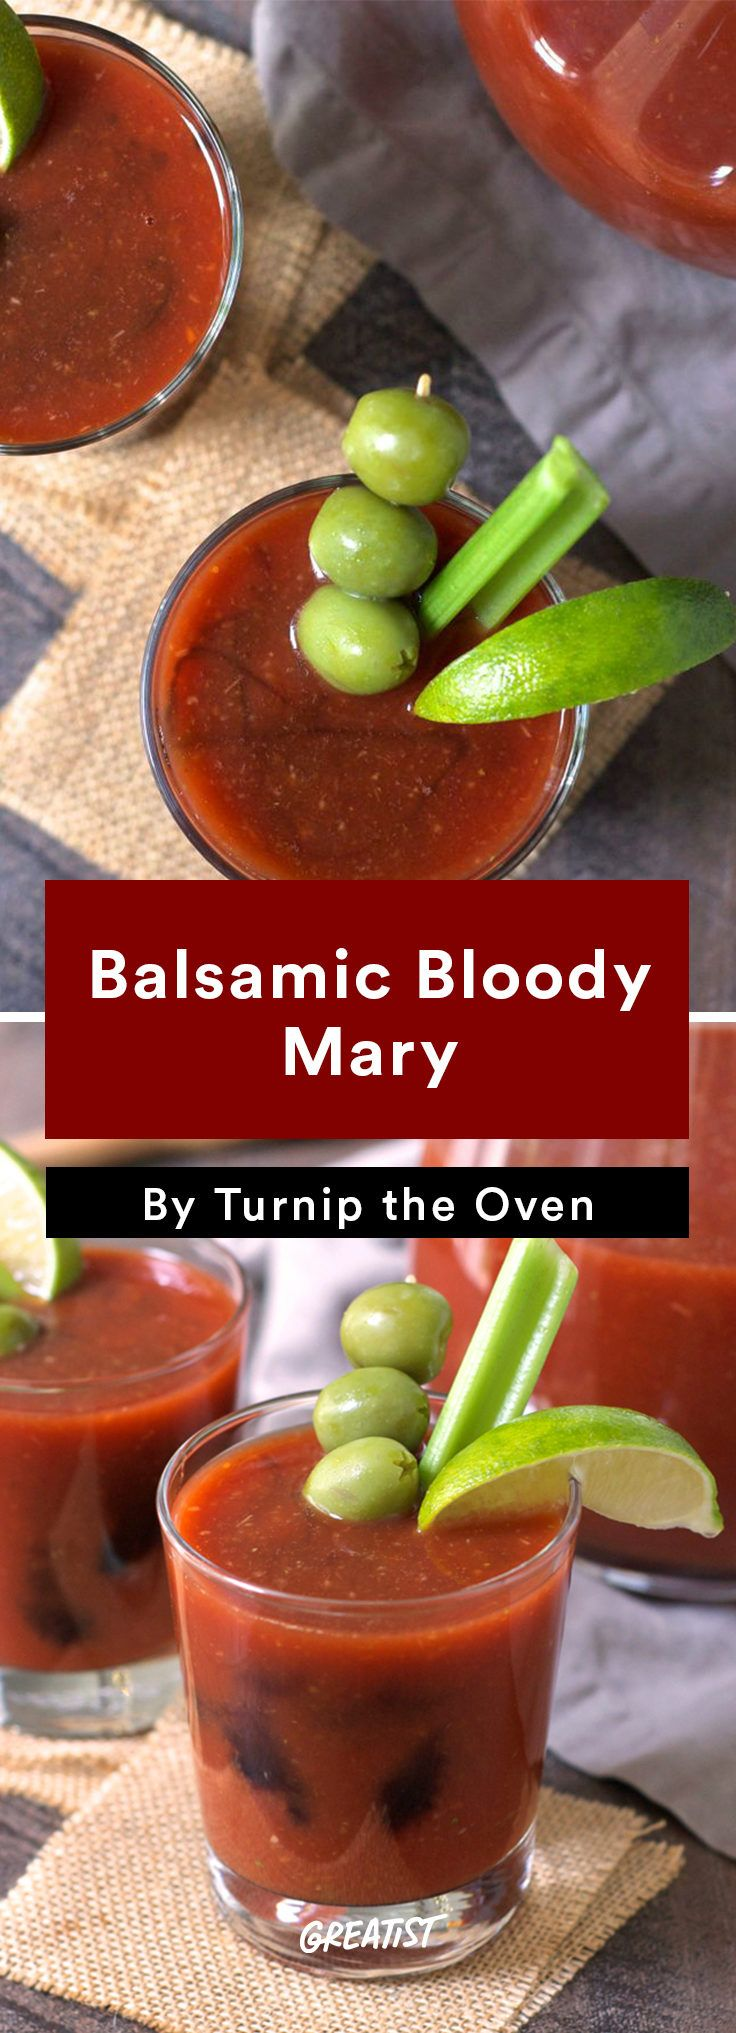 Balsamic Bloody Mary Recipe